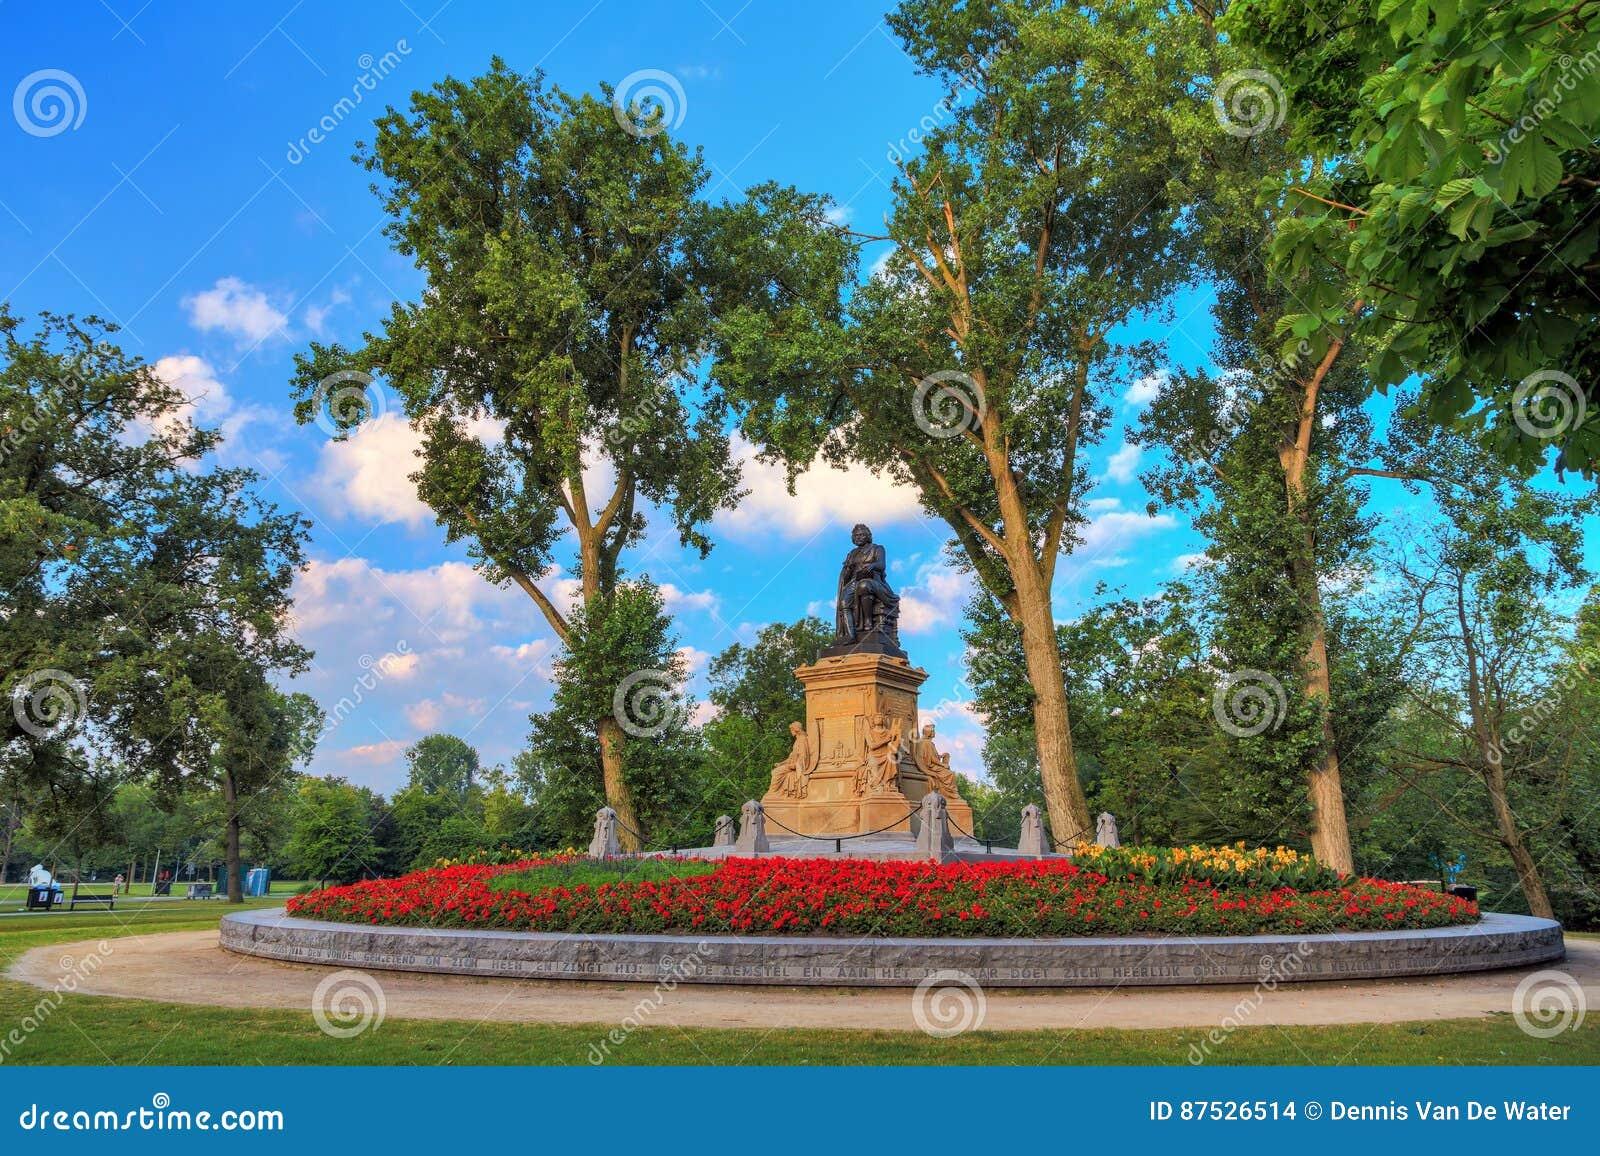 Statua di Vondel in primavera